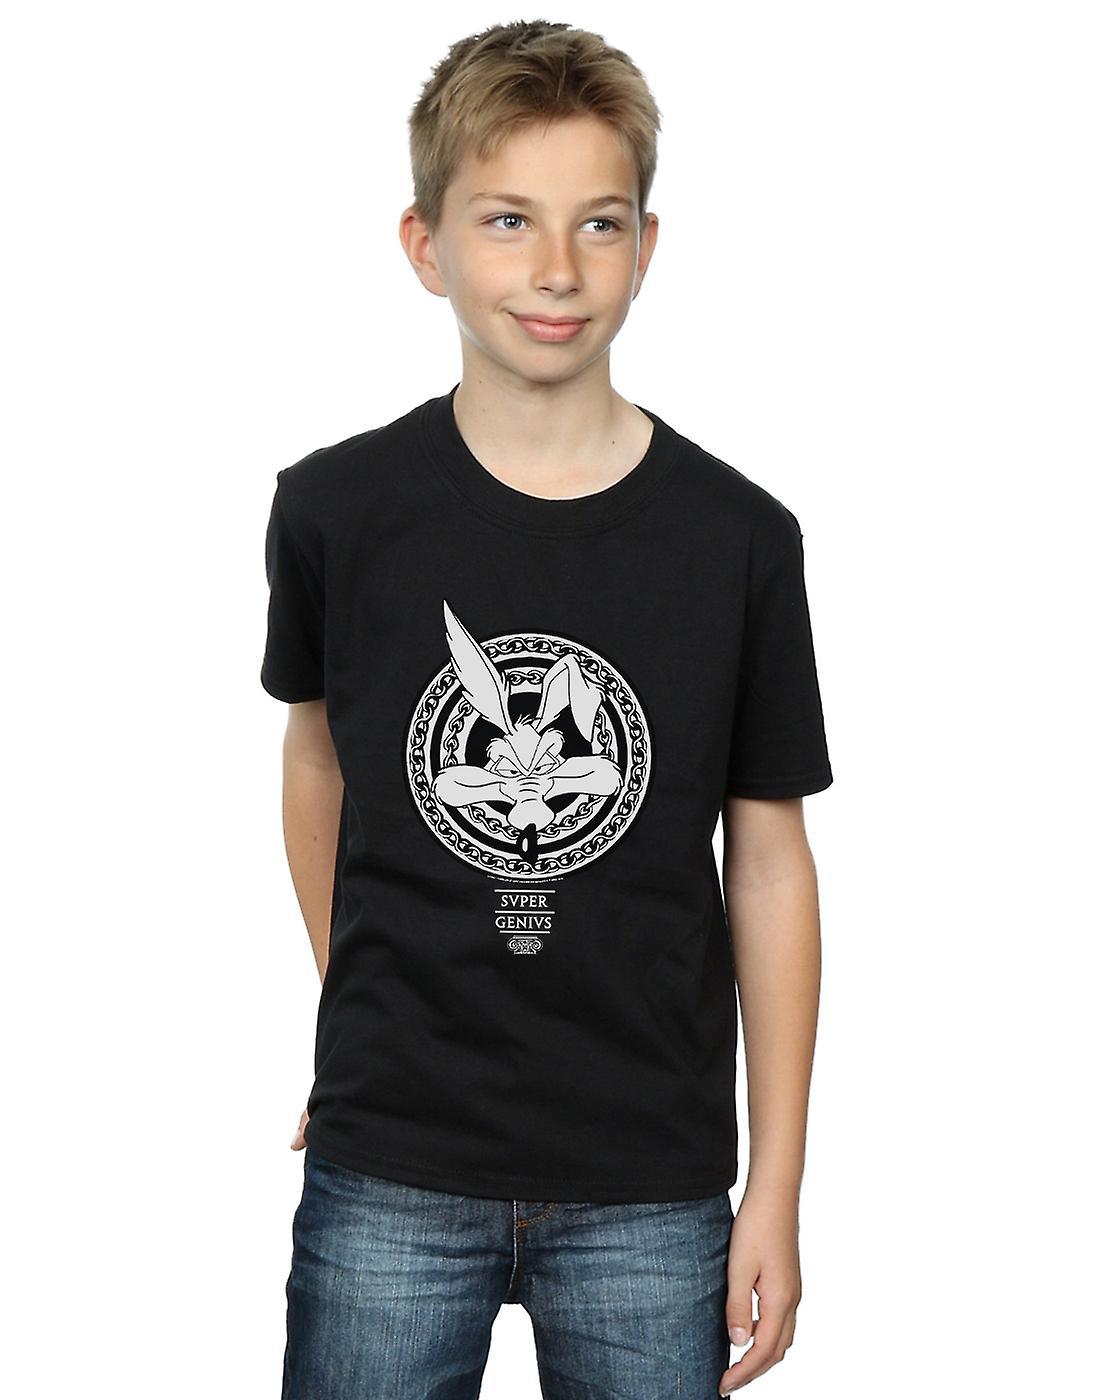 Looney Tunes Boys Wile E Coyote Super Genius T-Shirt